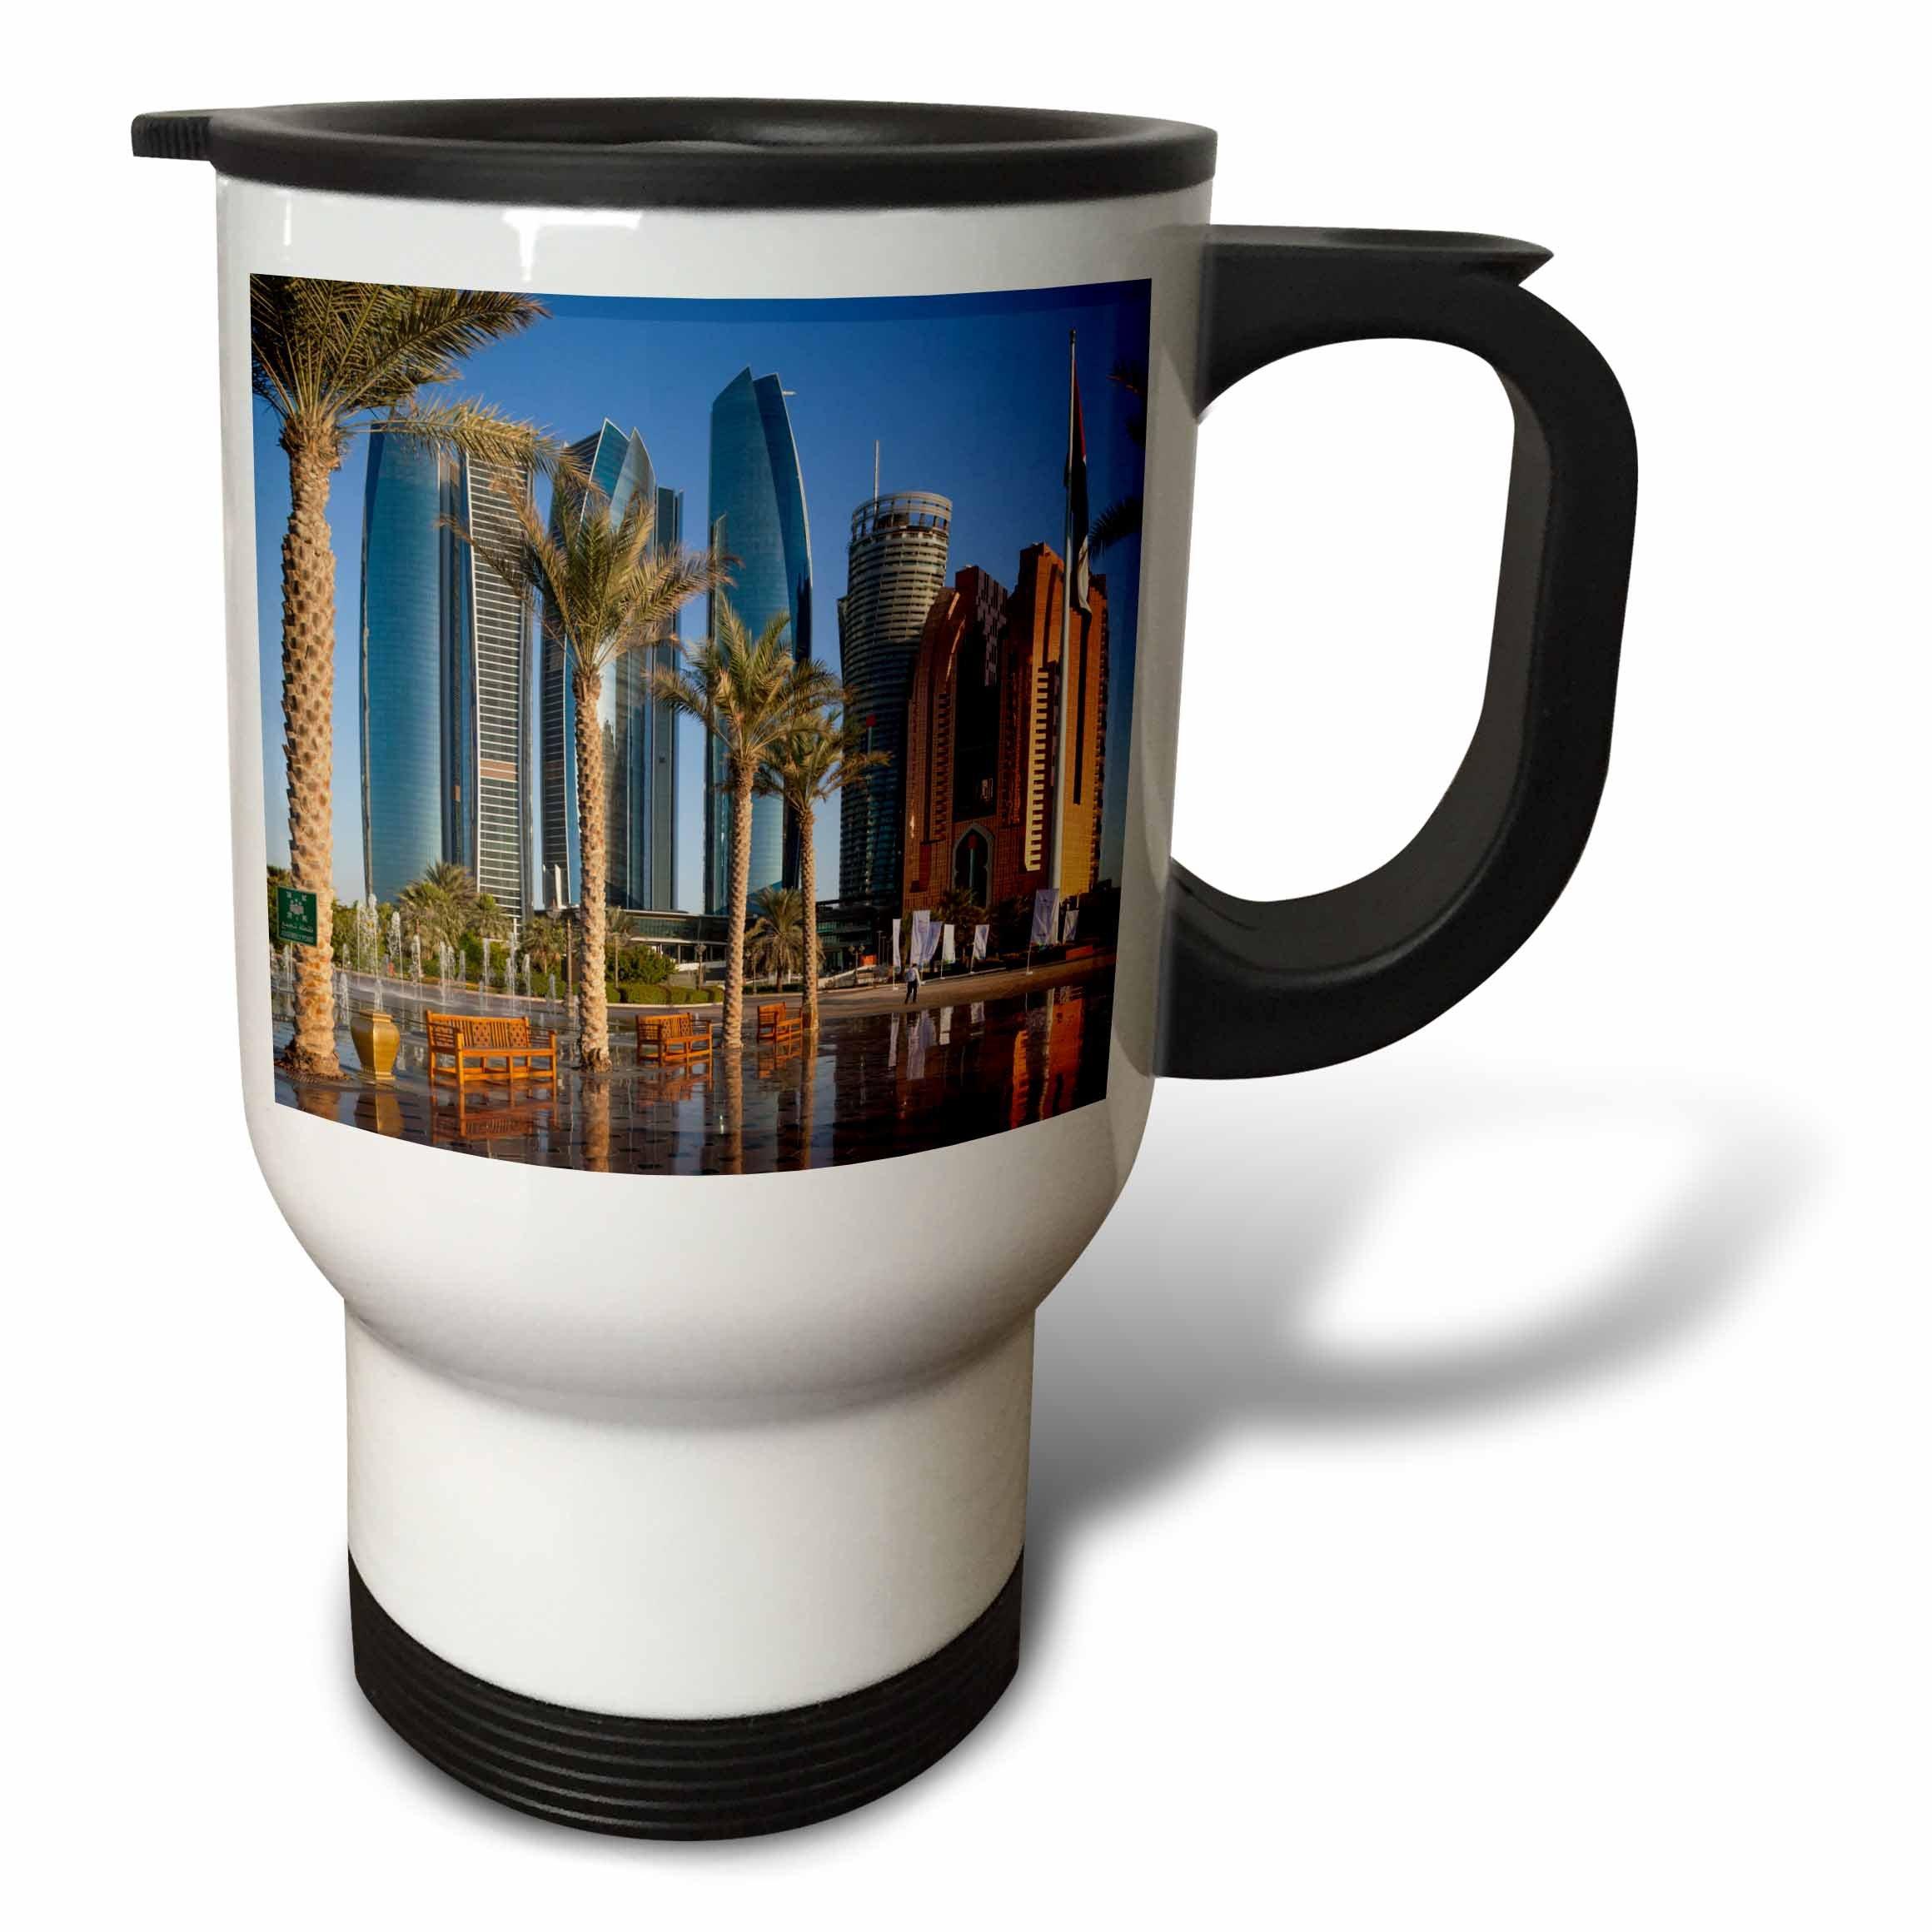 3dRose Danita Delimont - Cities - UAE, Abu Dhabi. Etihad Towers and Emirates Palace Hotel fountains - 14oz Stainless Steel Travel Mug (tm_277135_1)